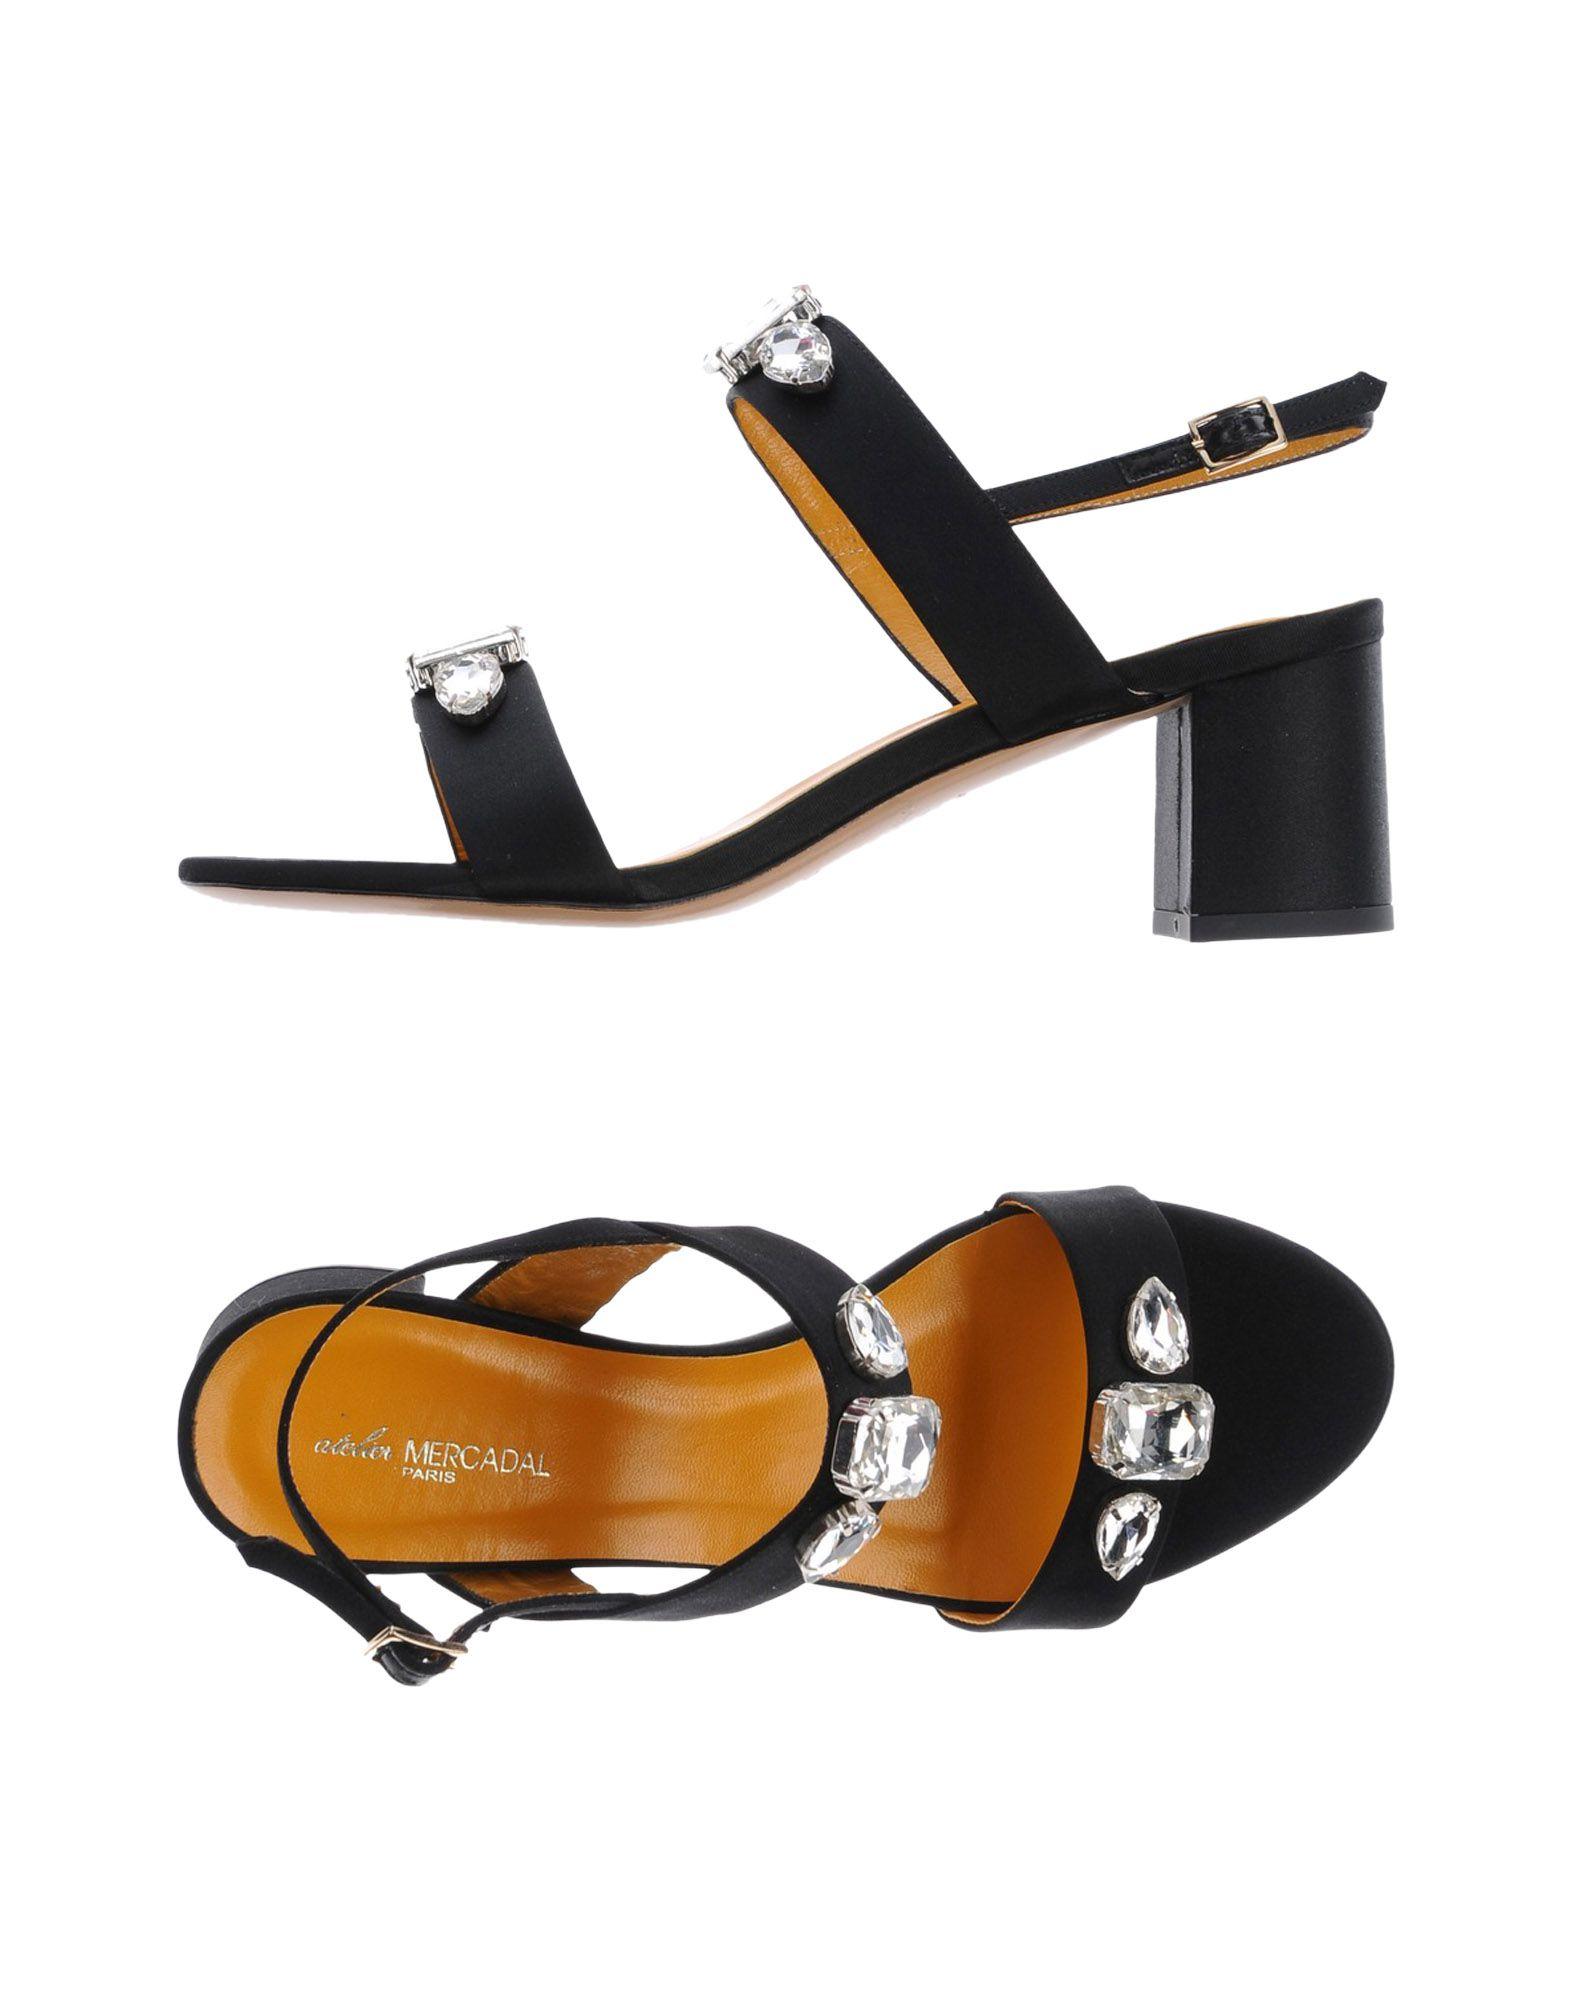 Atelier Mercadal Sandalen Damen  11452860UJ Gute Qualität beliebte Schuhe